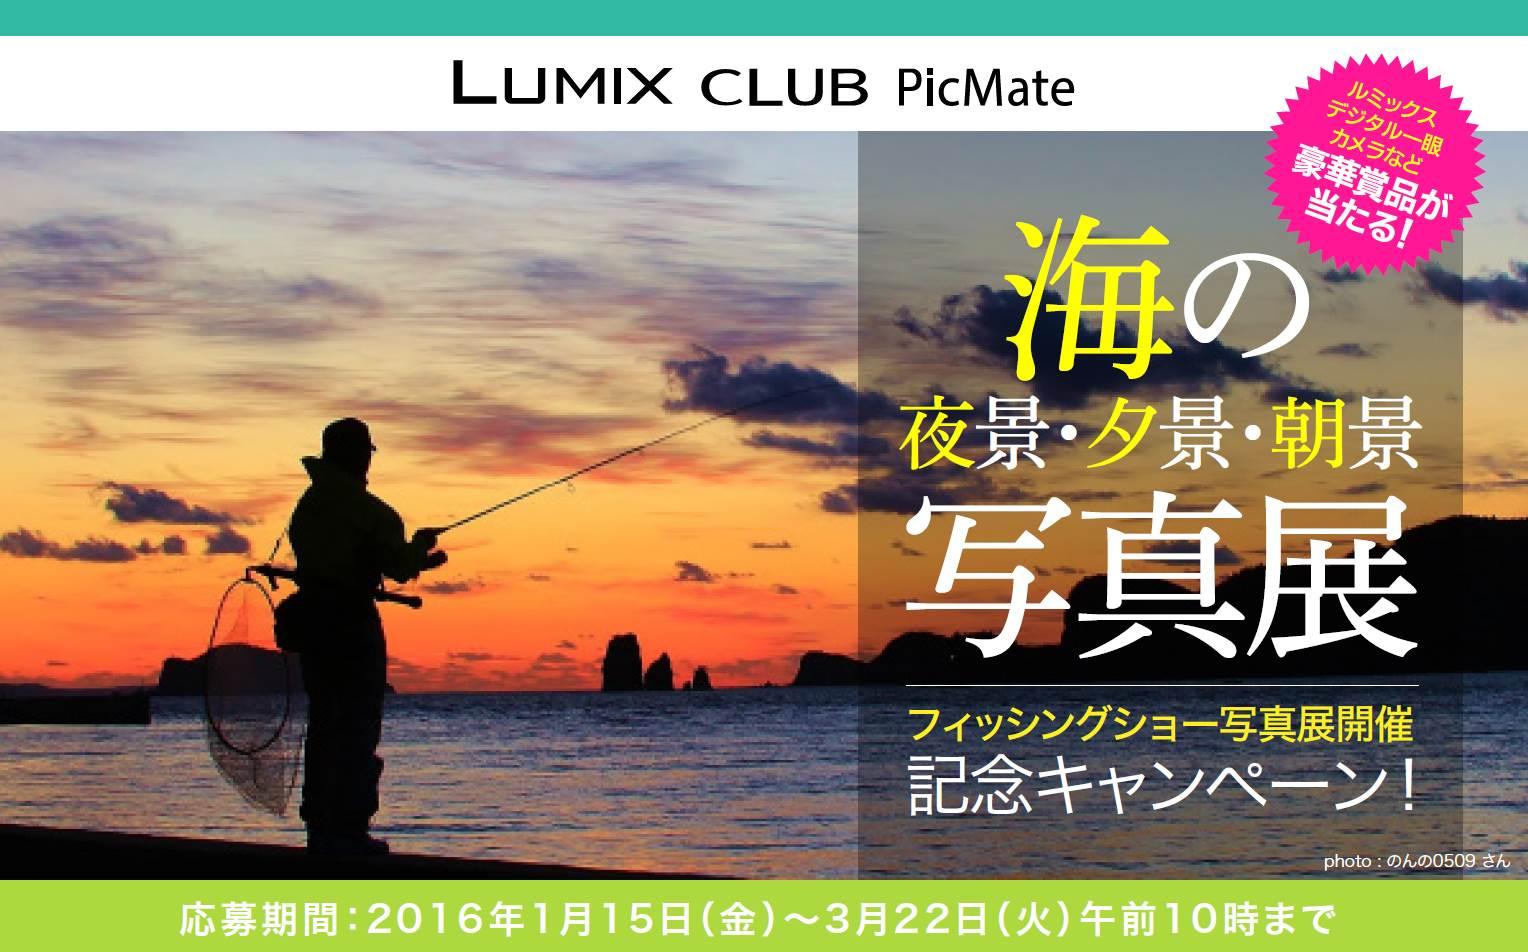 Picmate「海の夜景・夕景・朝景 写真展」